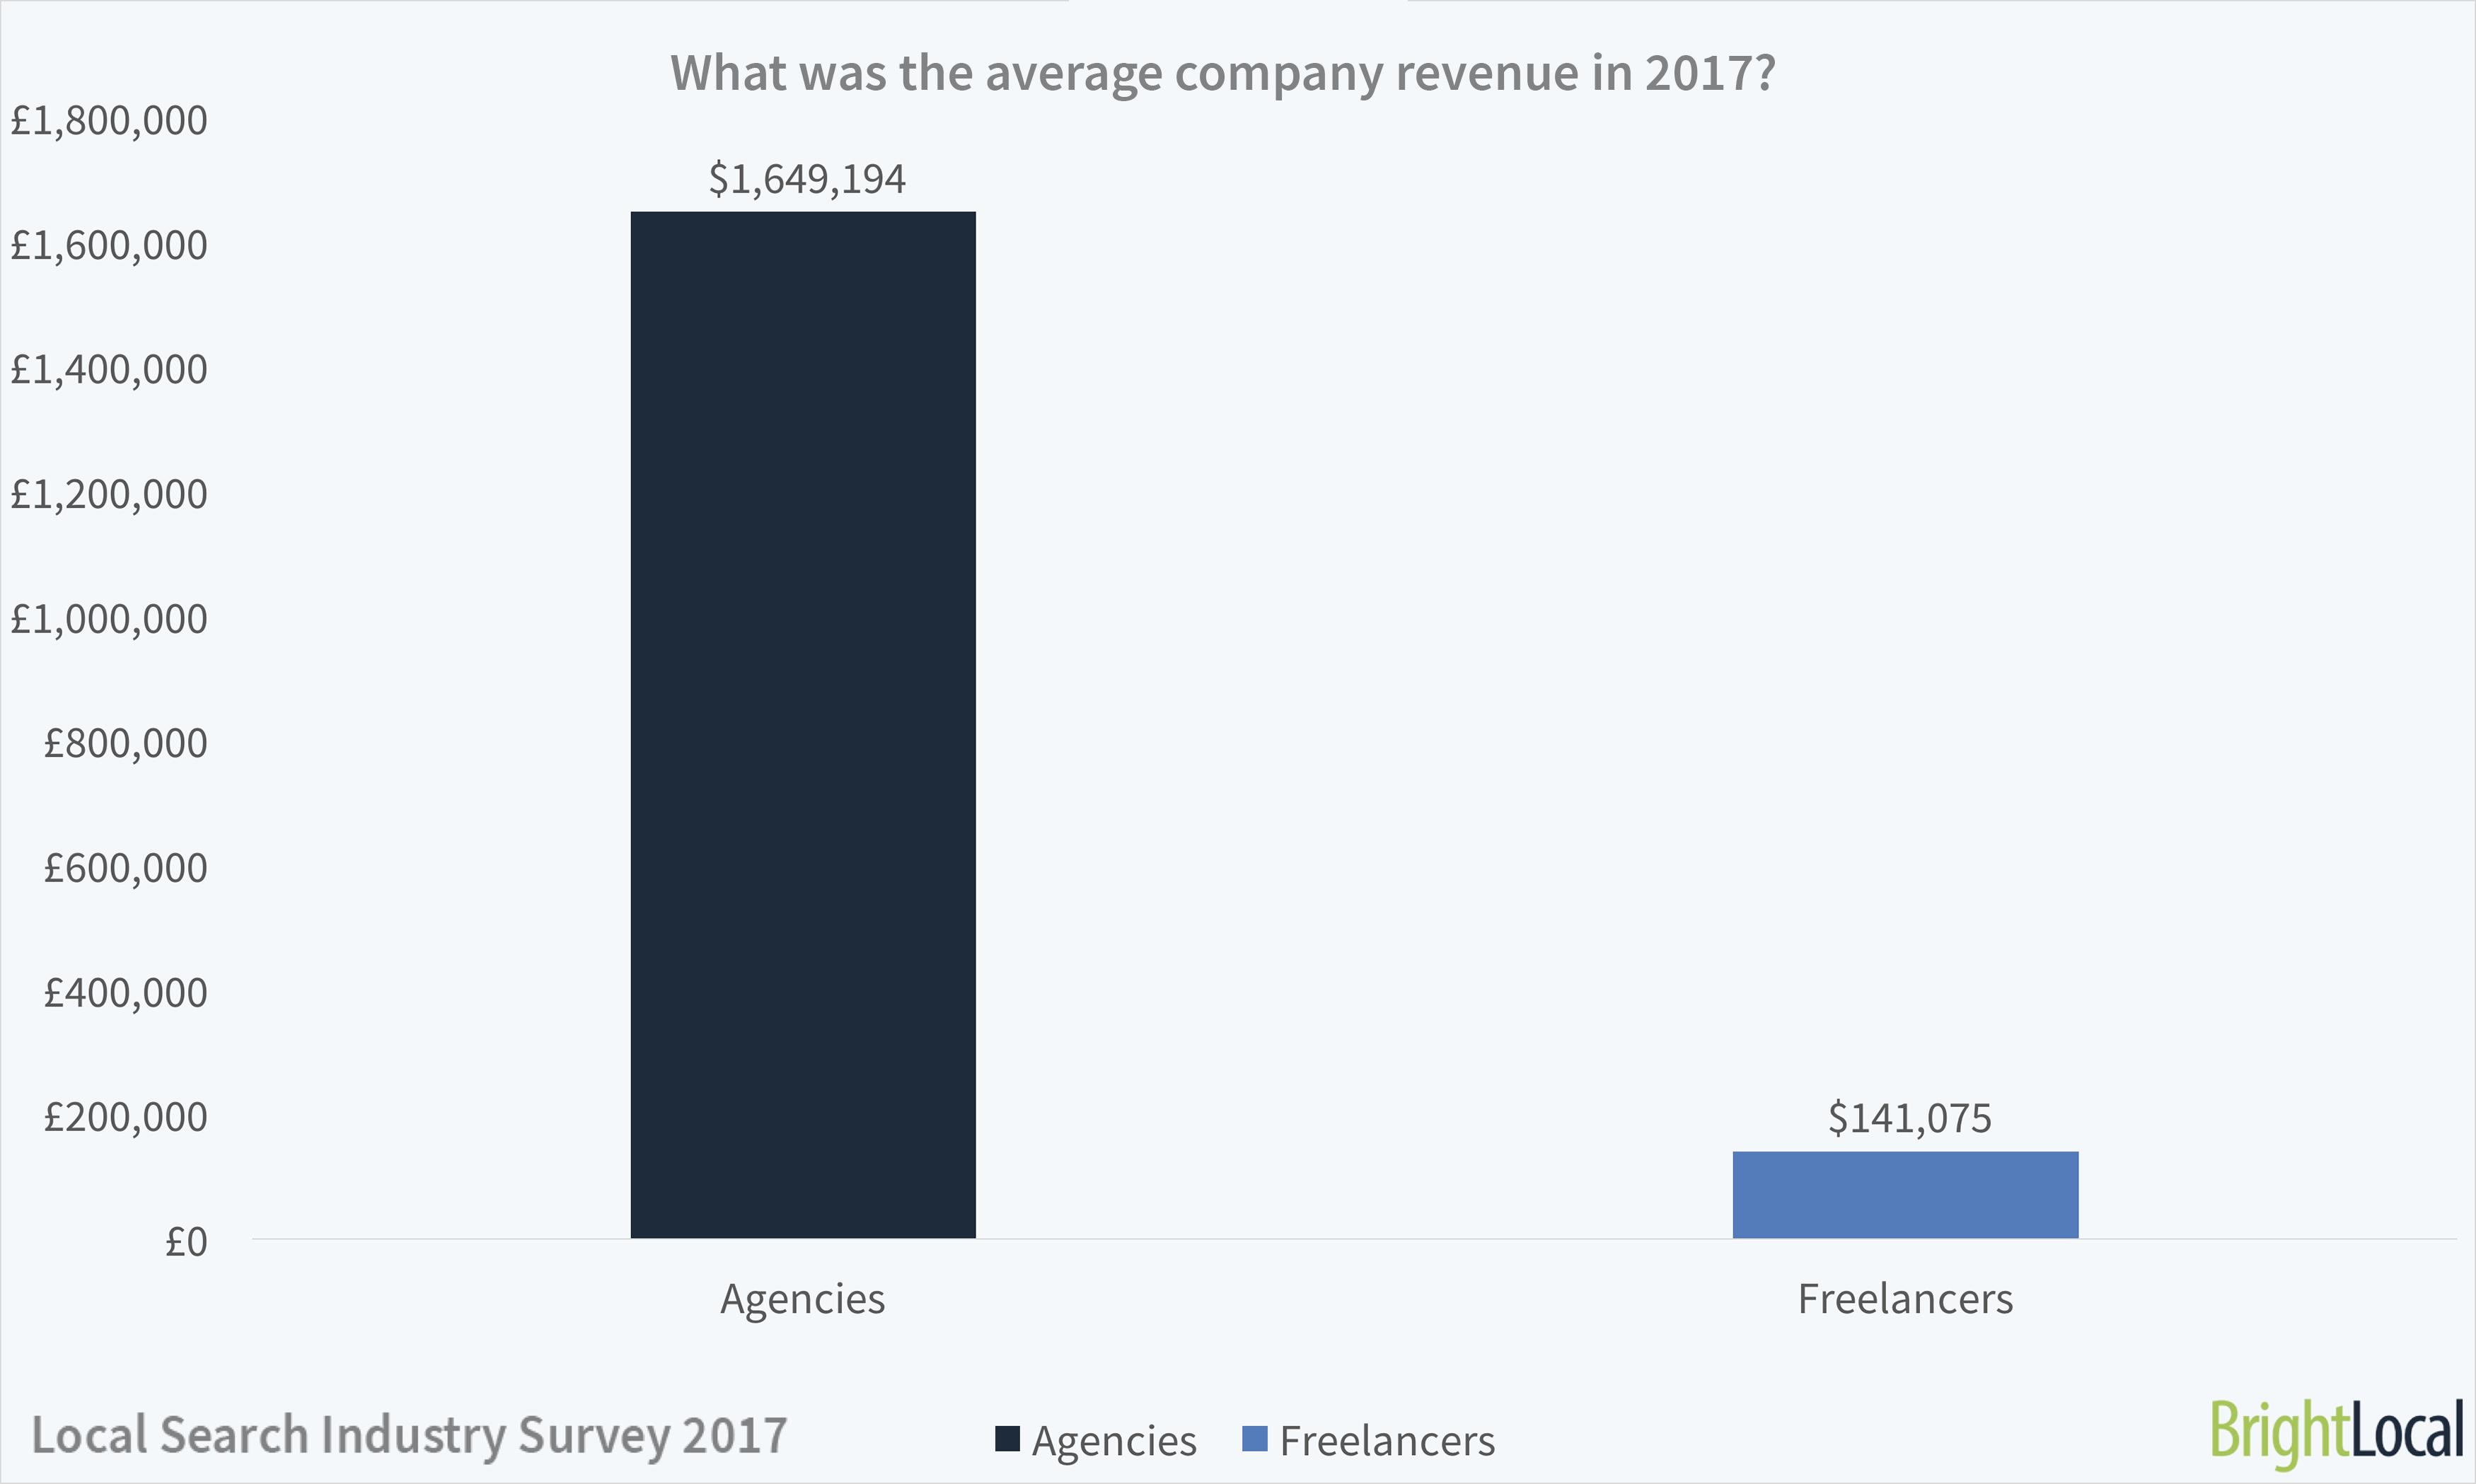 Average revenue of SEO agencies and freelancers